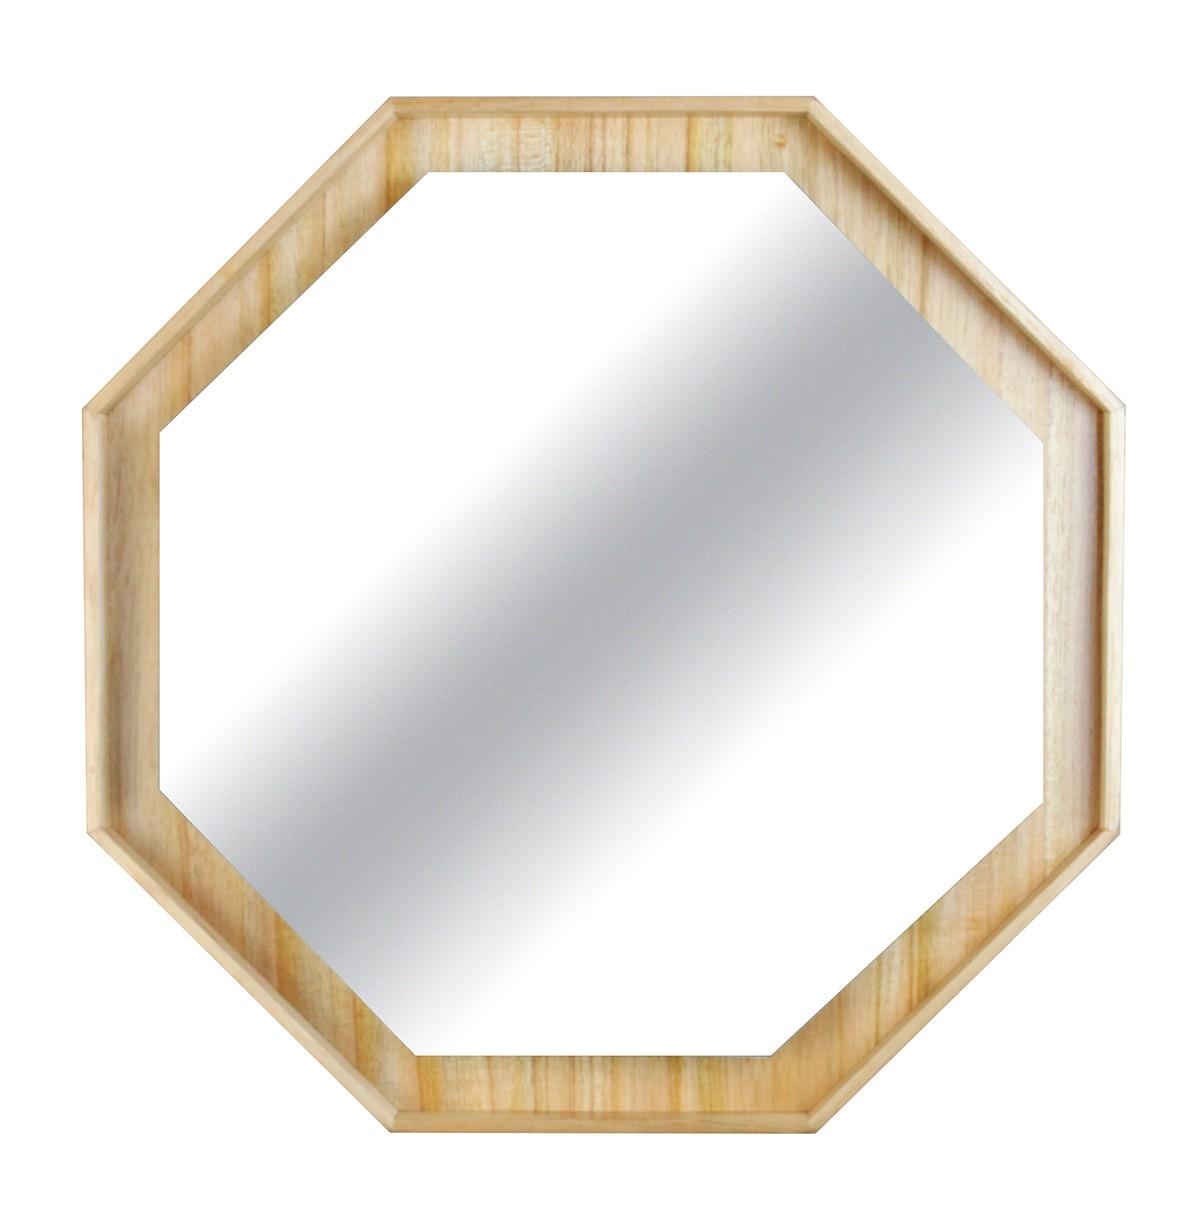 Espelho Barroco Octavado